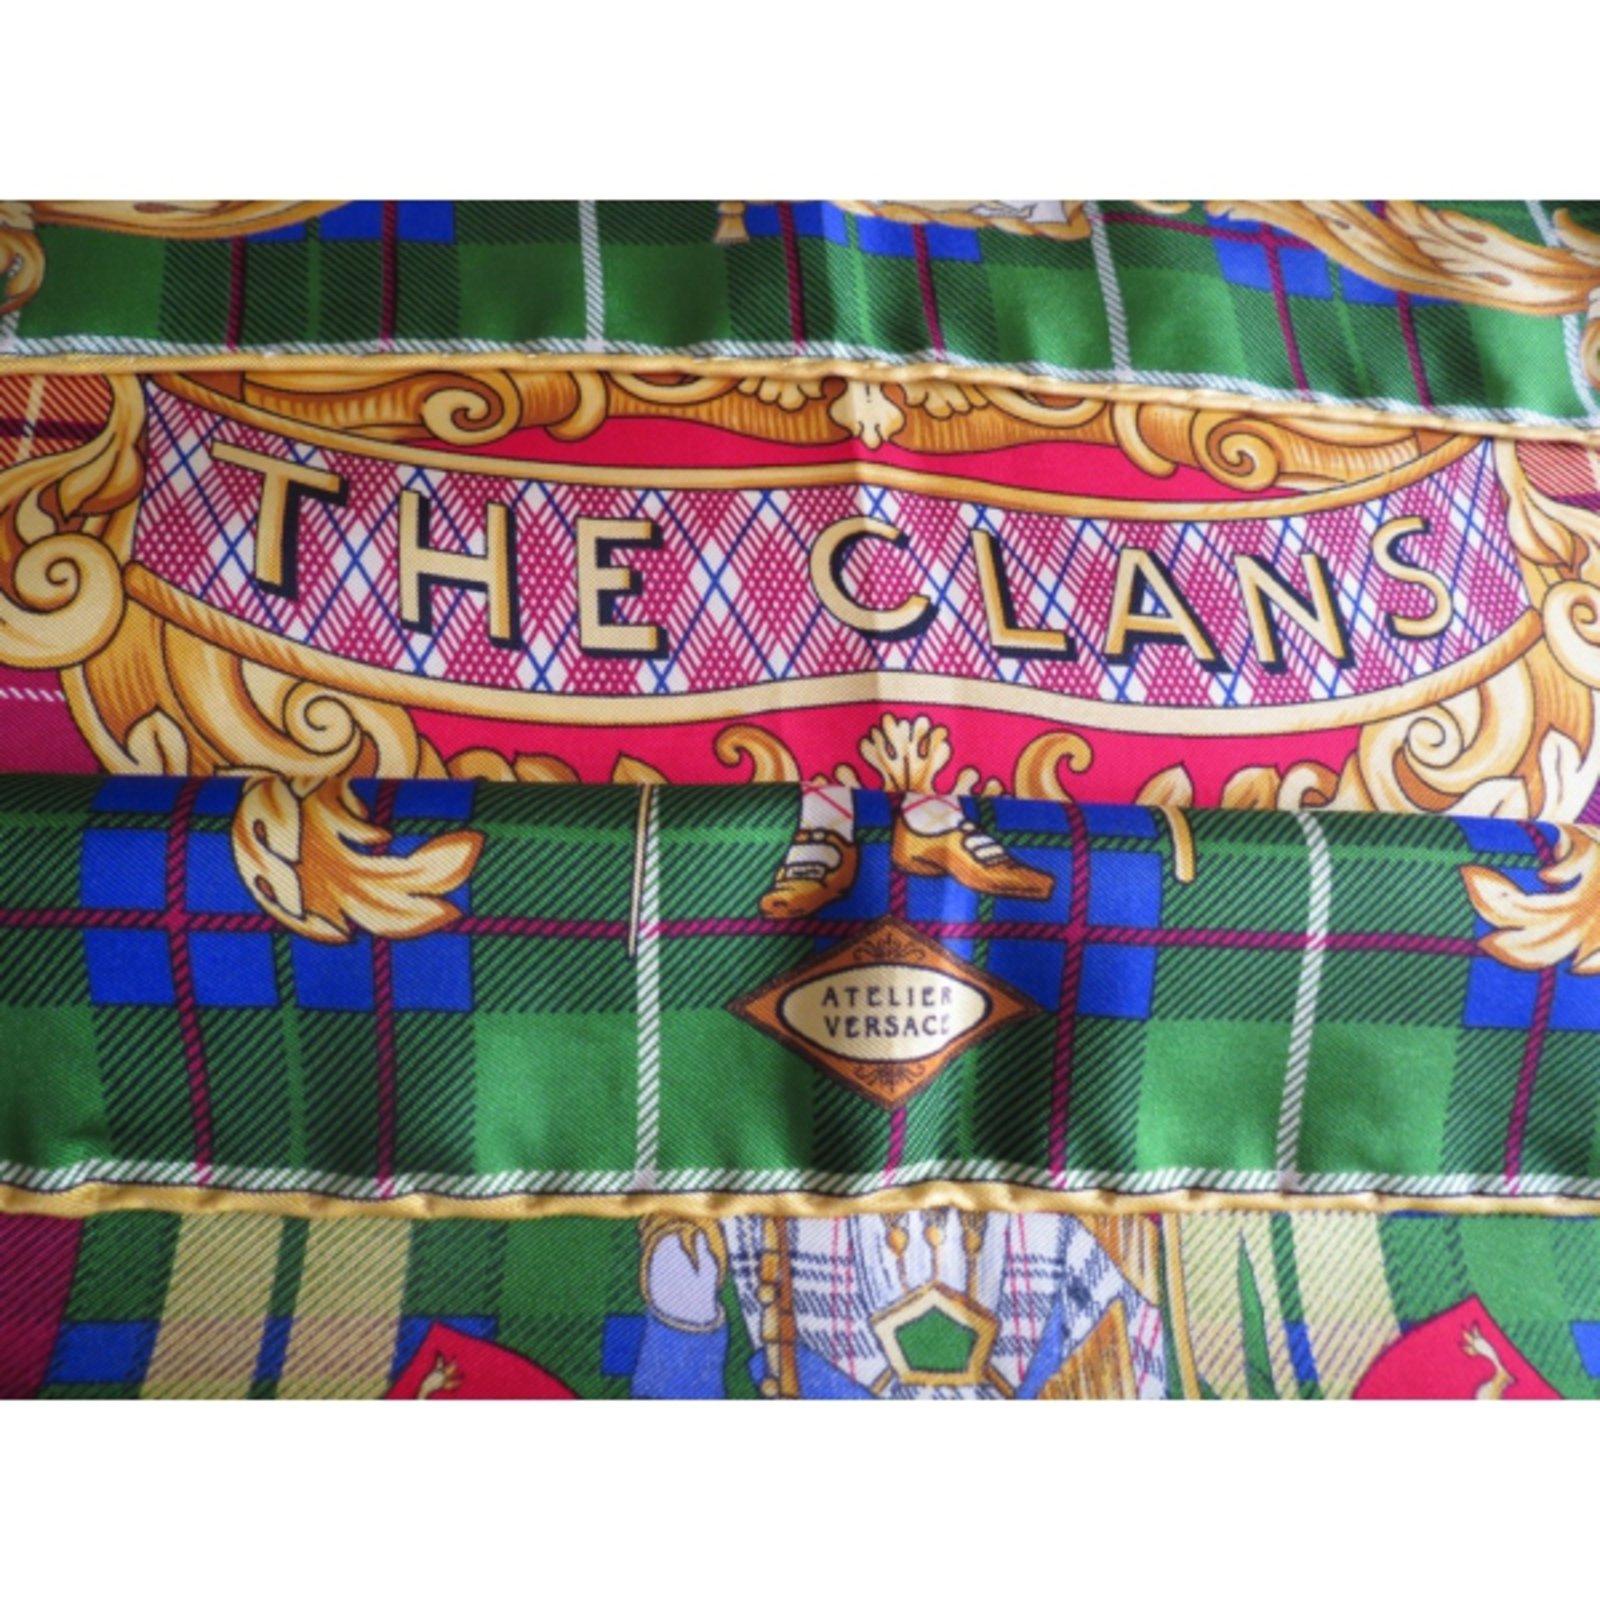 6cba8599 -Malta silk scarf Atelier Versace